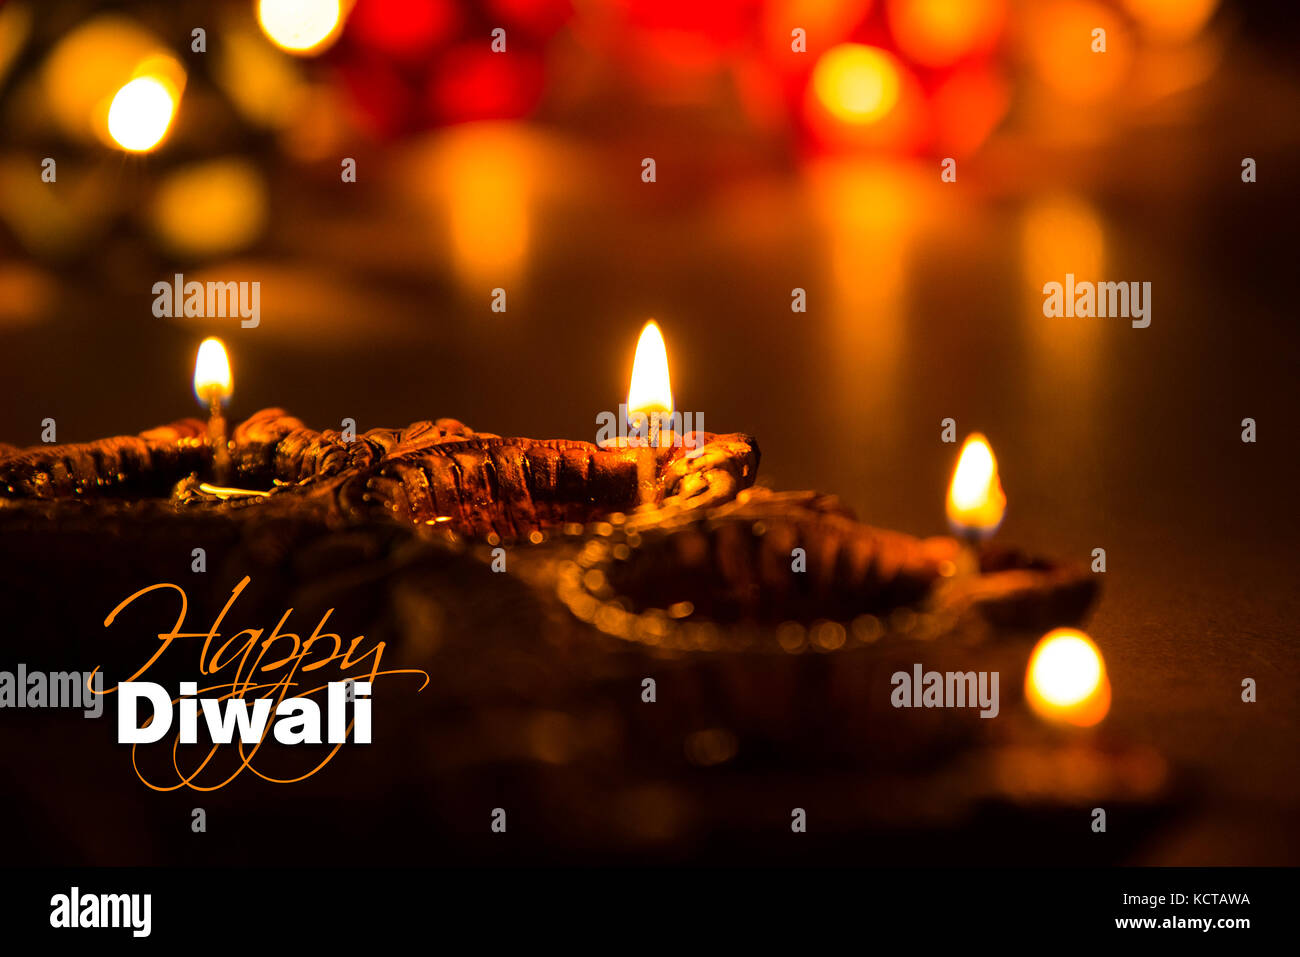 Diwali greetings stock photos diwali greetings stock images alamy stock photo of diwali greeting card showing illuminated diya or oil lamp or panti with happy m4hsunfo